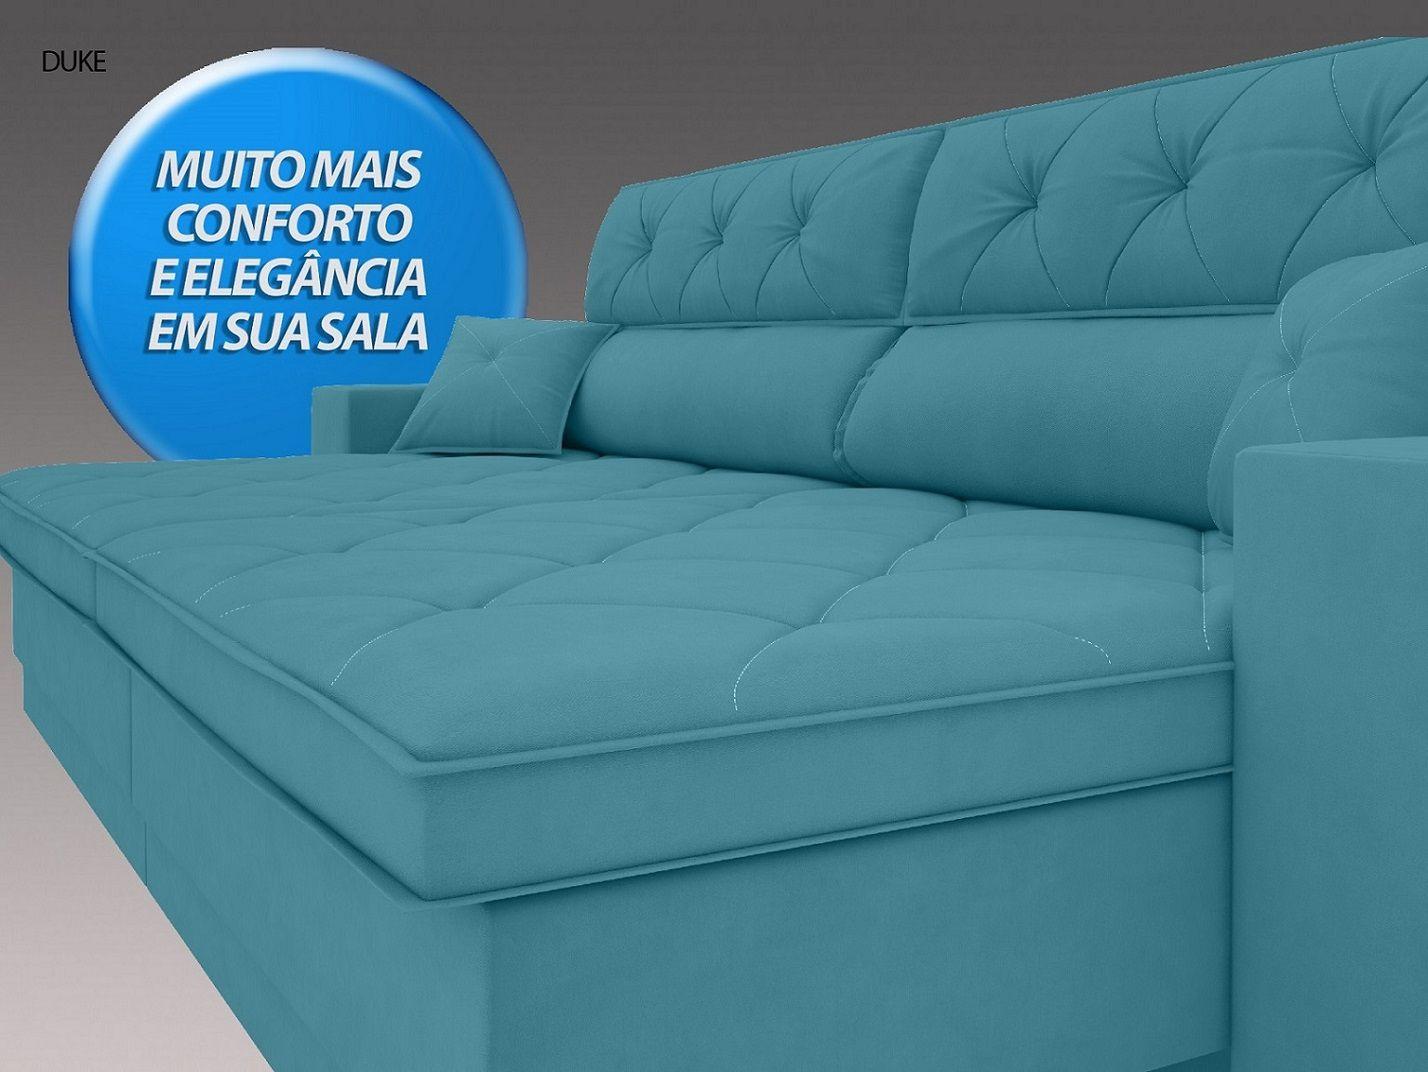 Sofá Duke 2,70m Retrátil e Reclinável Velosuede Turquesa  - NETSOFAS  - NETSOFÁS